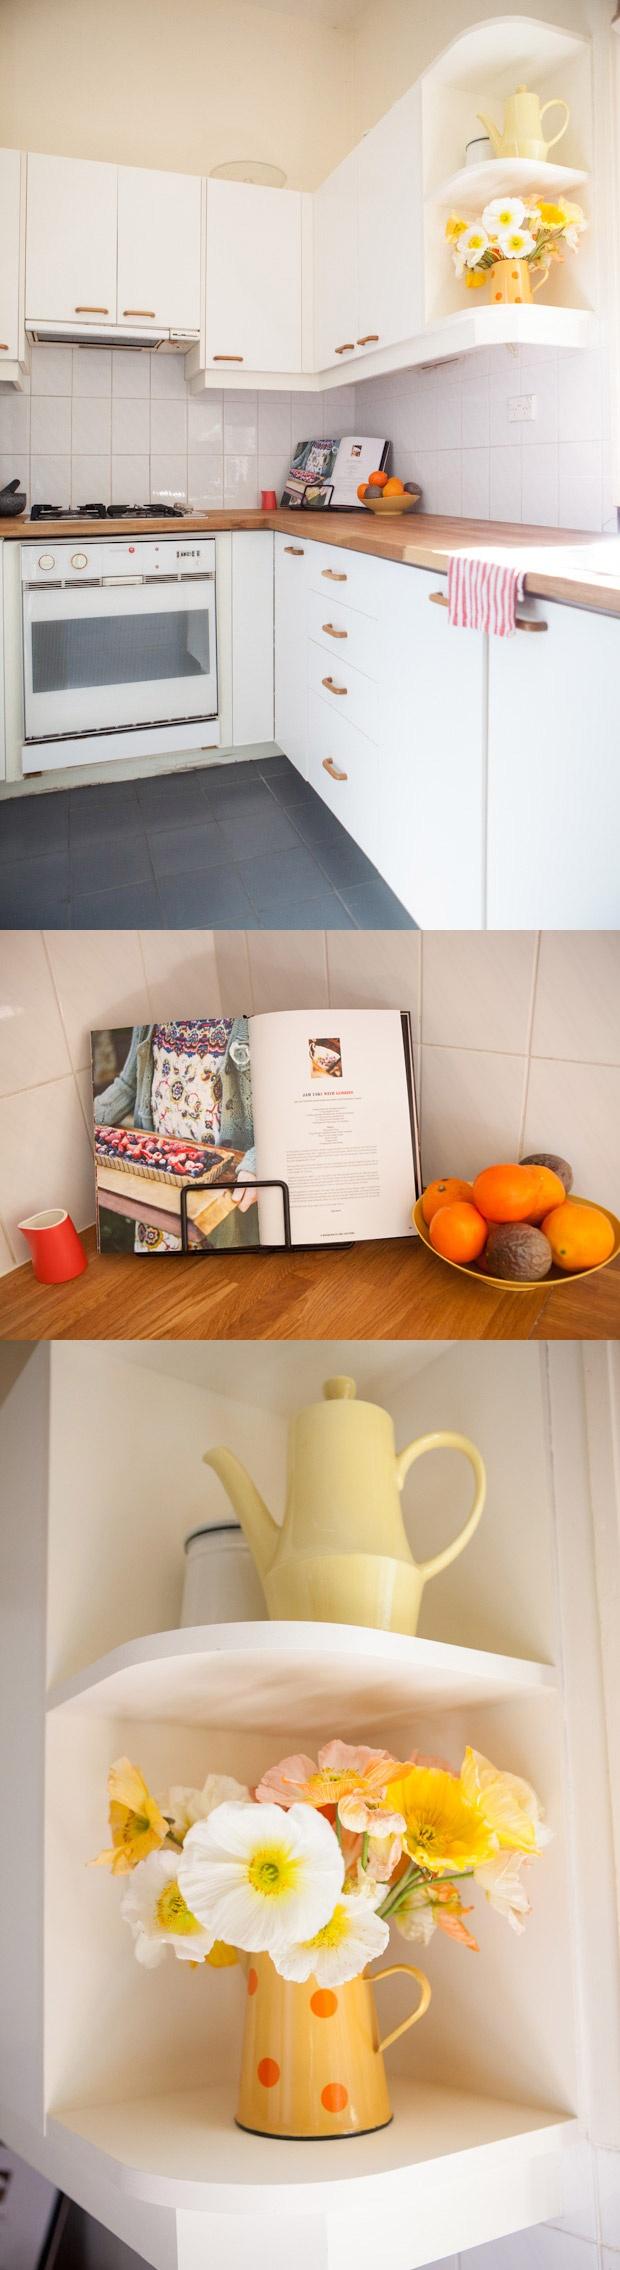 Homes interiors inspiration - Claire Yvonne Evans - Ashka interview #homes #interiors #inspirations #creative #sydney #australia #kitchen #vintage #cookbook #white